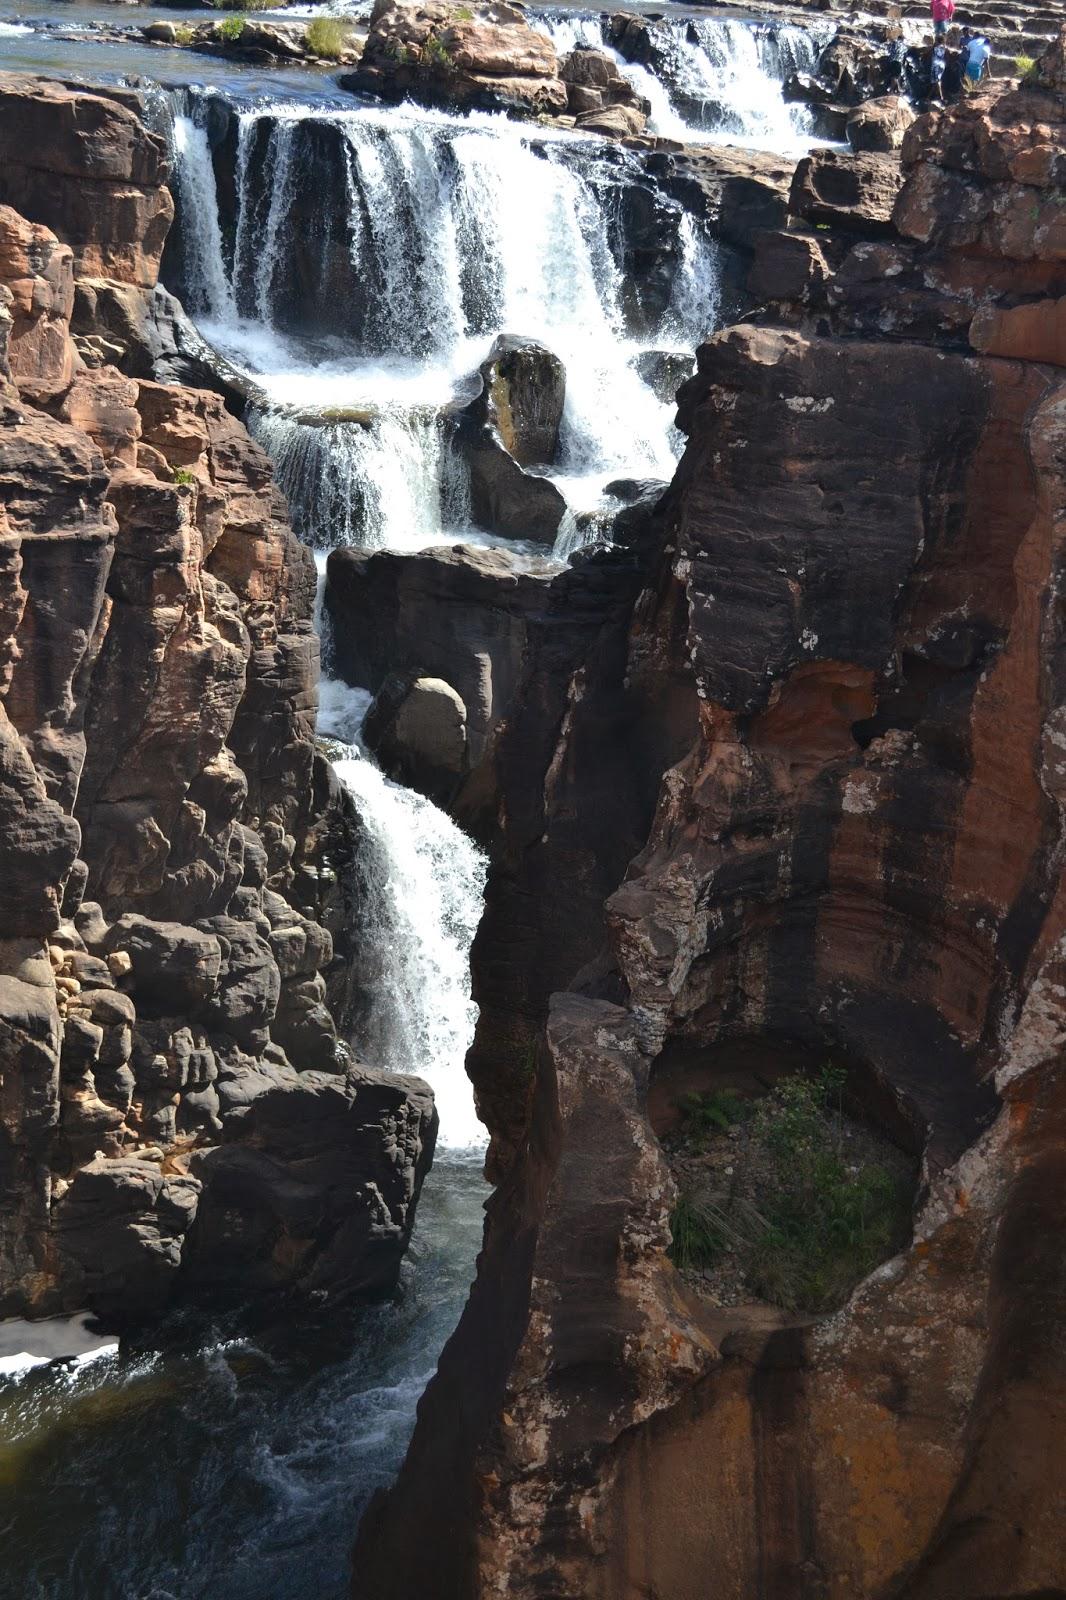 Bourke's Luck Potholes waterfall